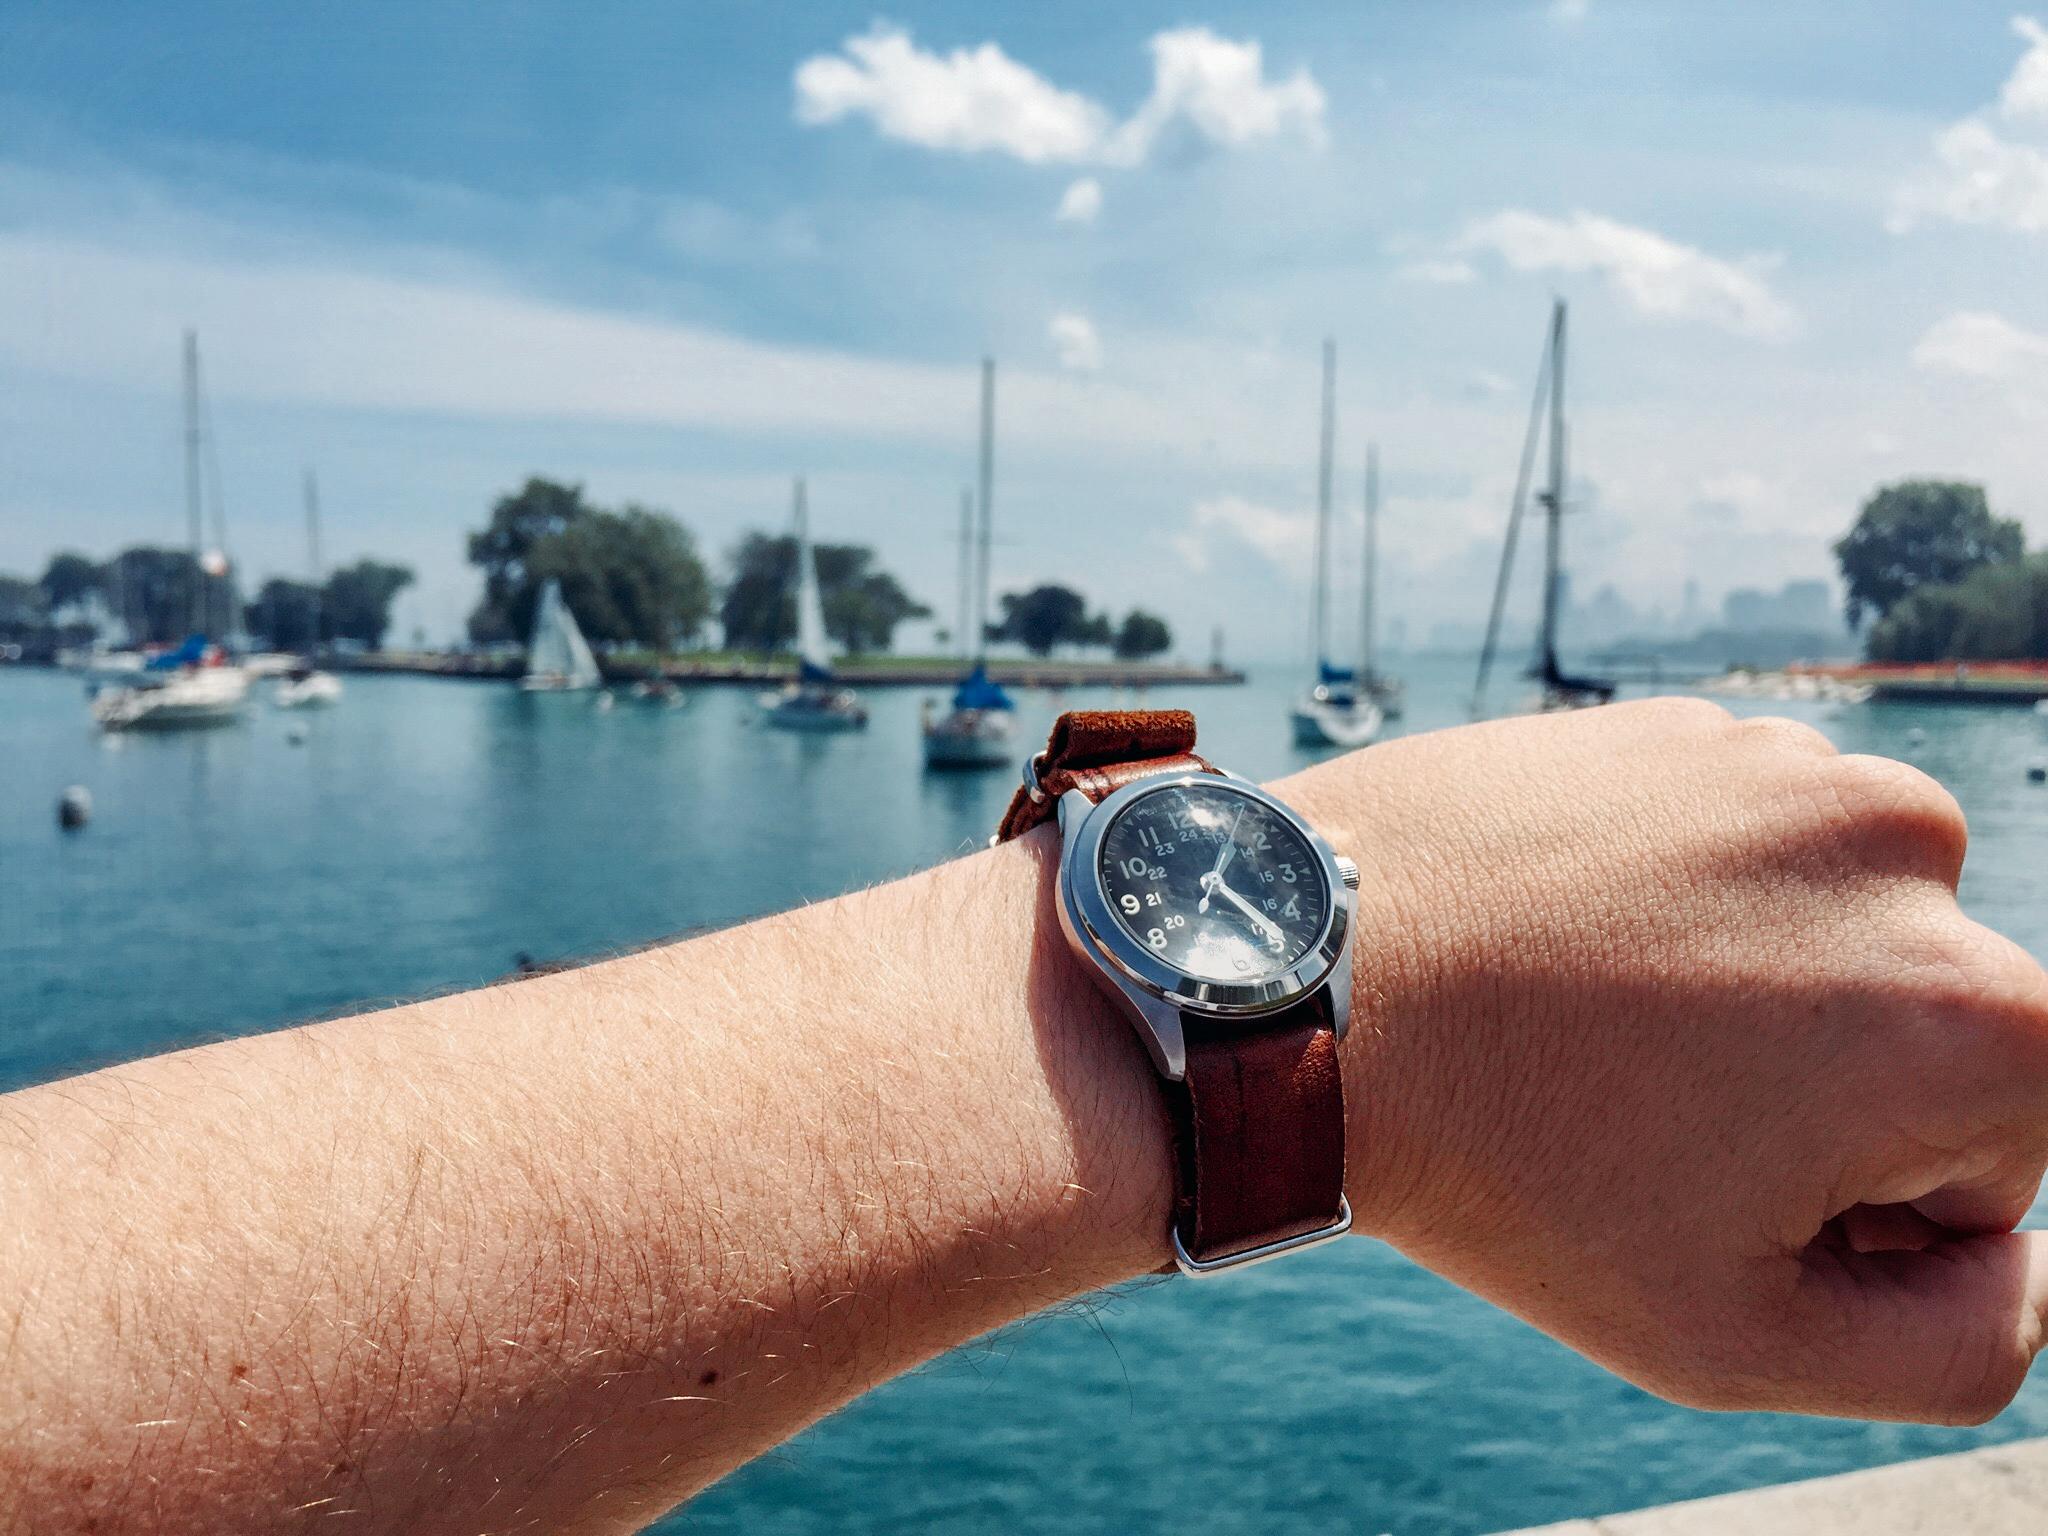 The  Traveling Watch at Montrose Harbor. Photo credit: Chris Scott